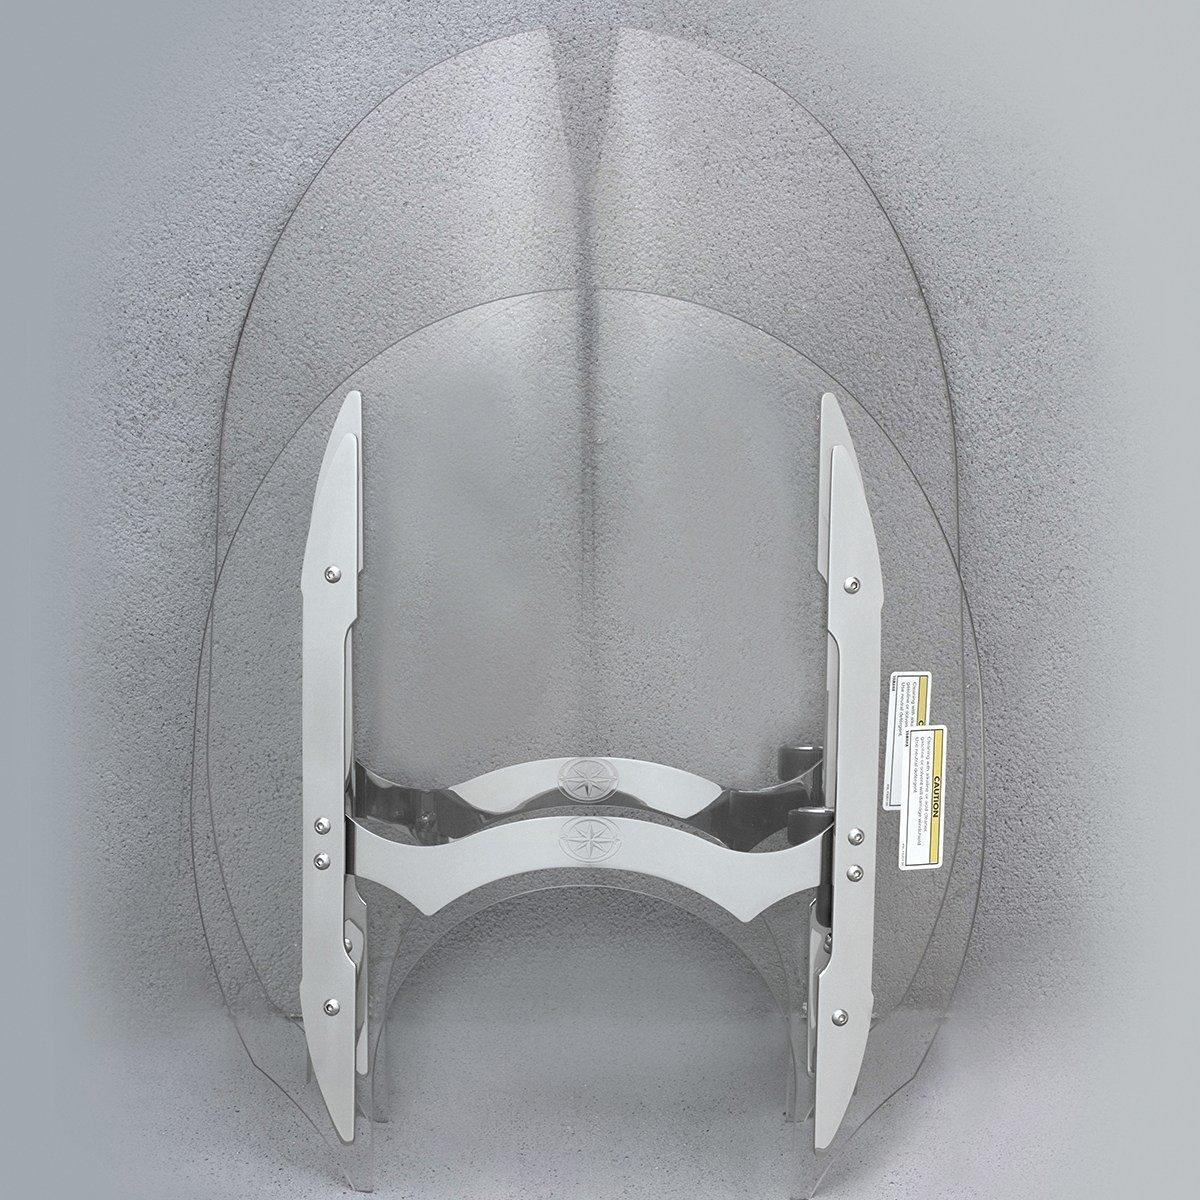 "Genuine Yamaha O.E.M. Raider Quick-Release Windshield Short Windshield (14"") pt# 5C7-F83J0-S0-00"